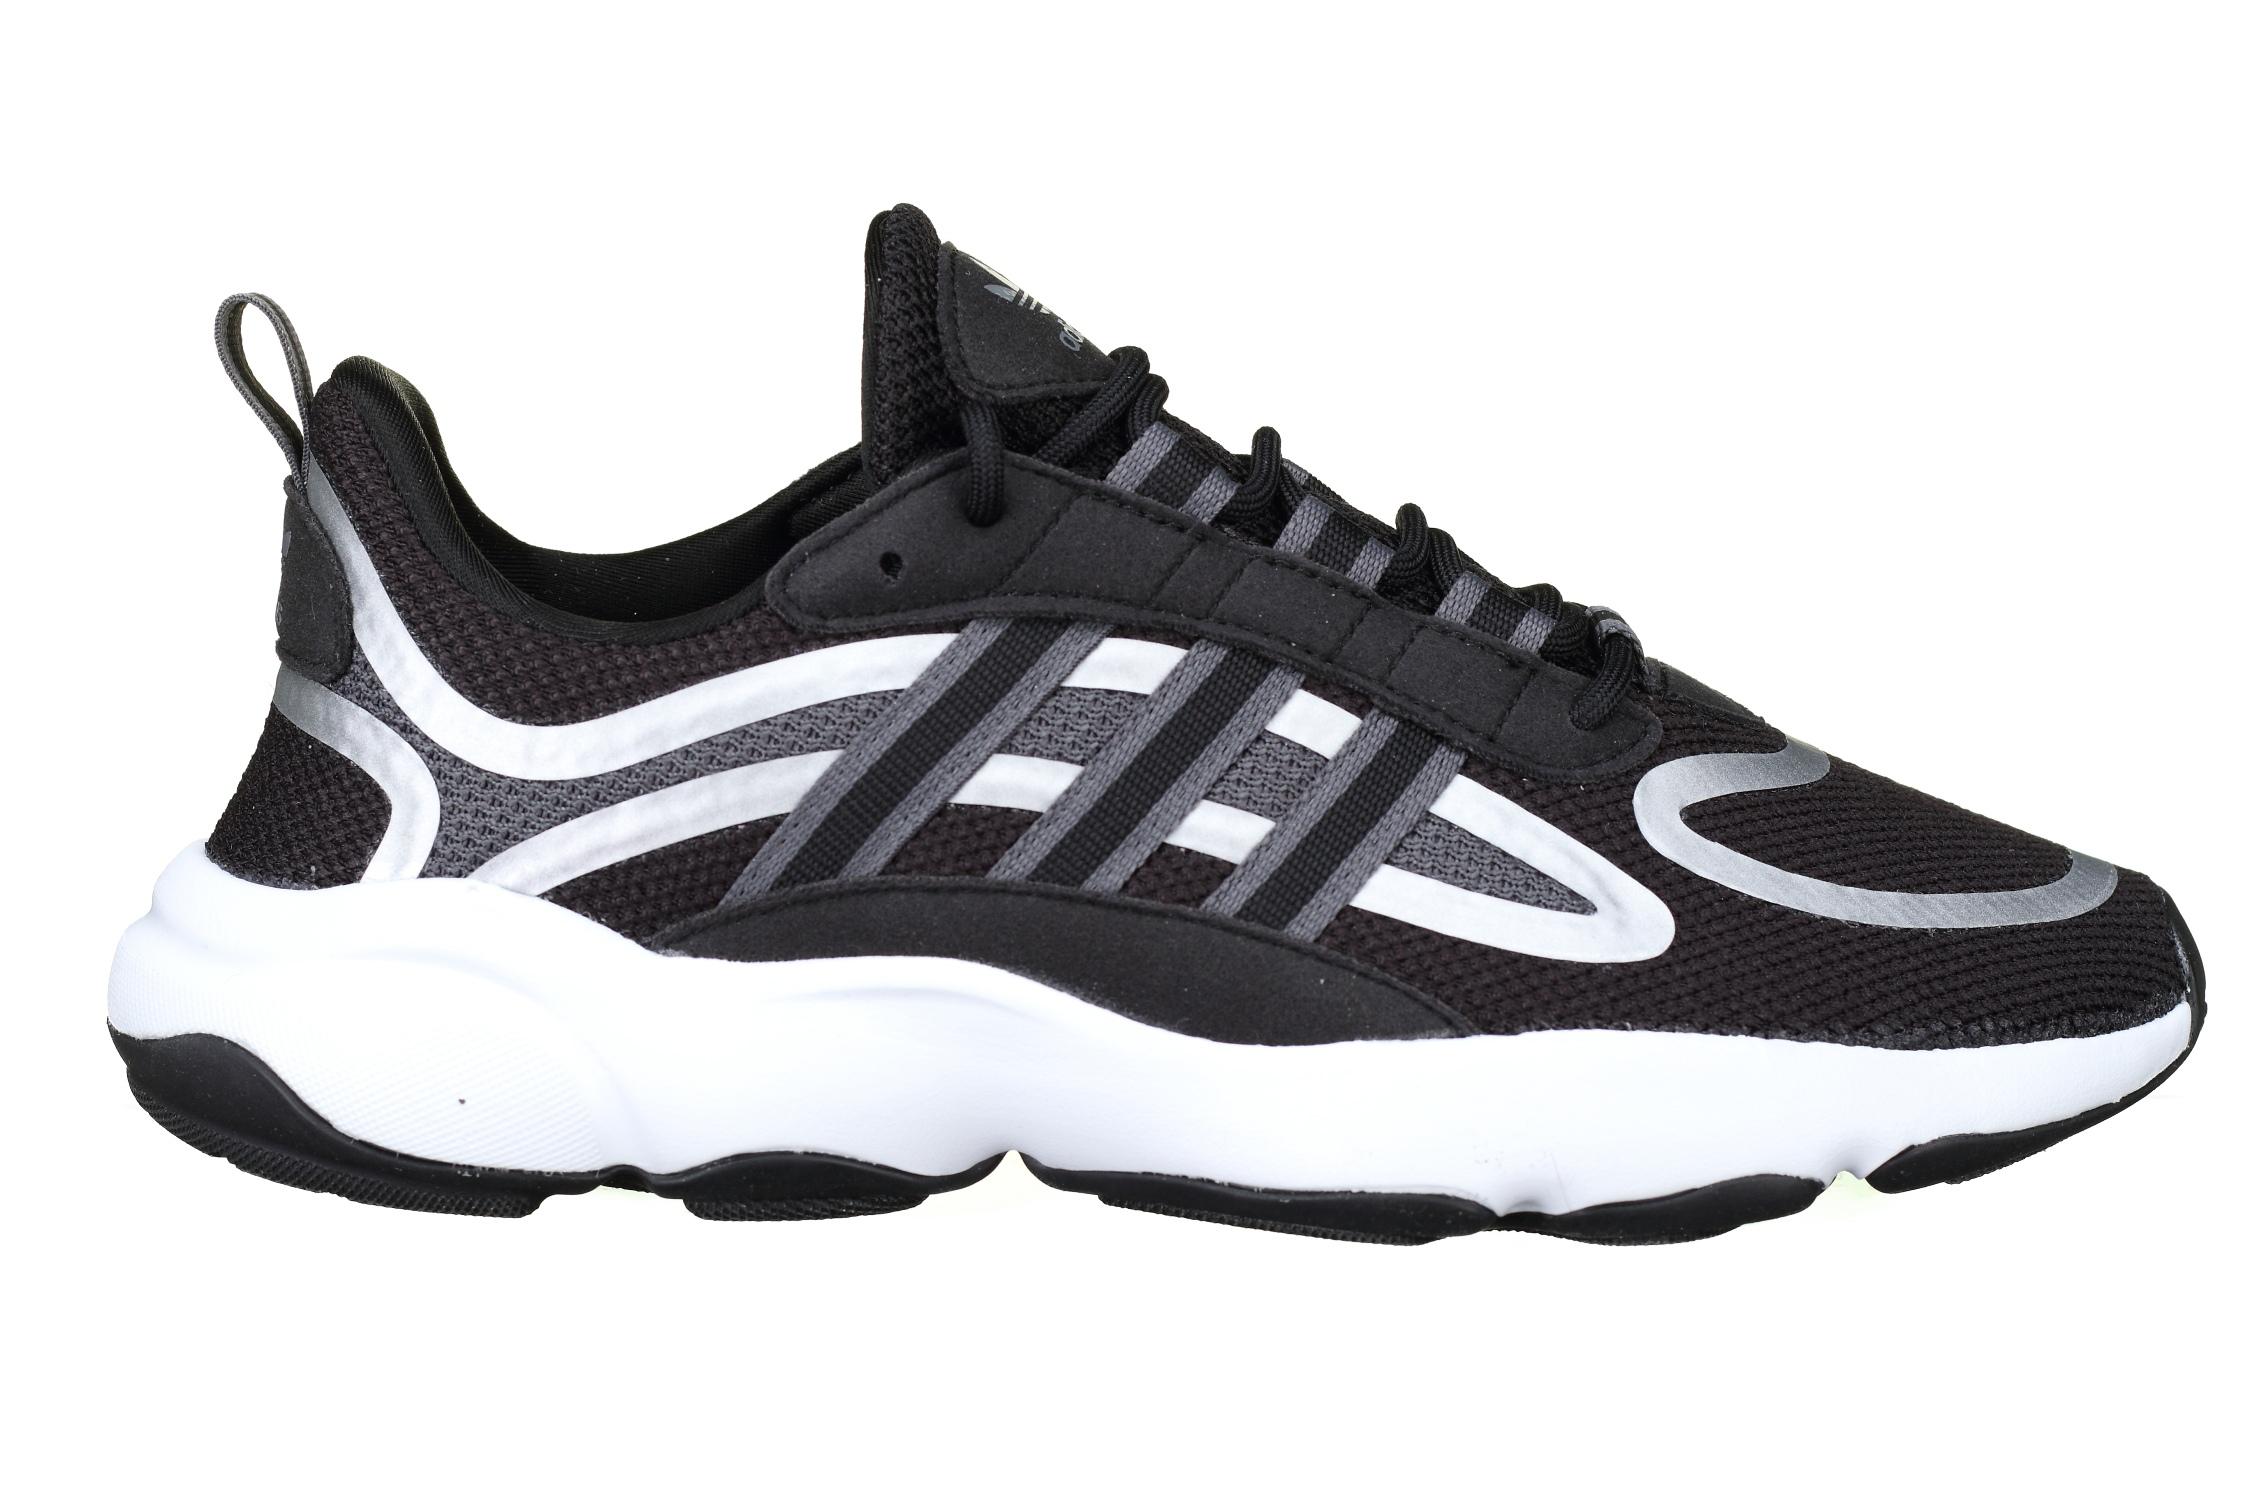 https://www.leadermode.com/187117/adidas-haiwee-eg9571-black.jpg